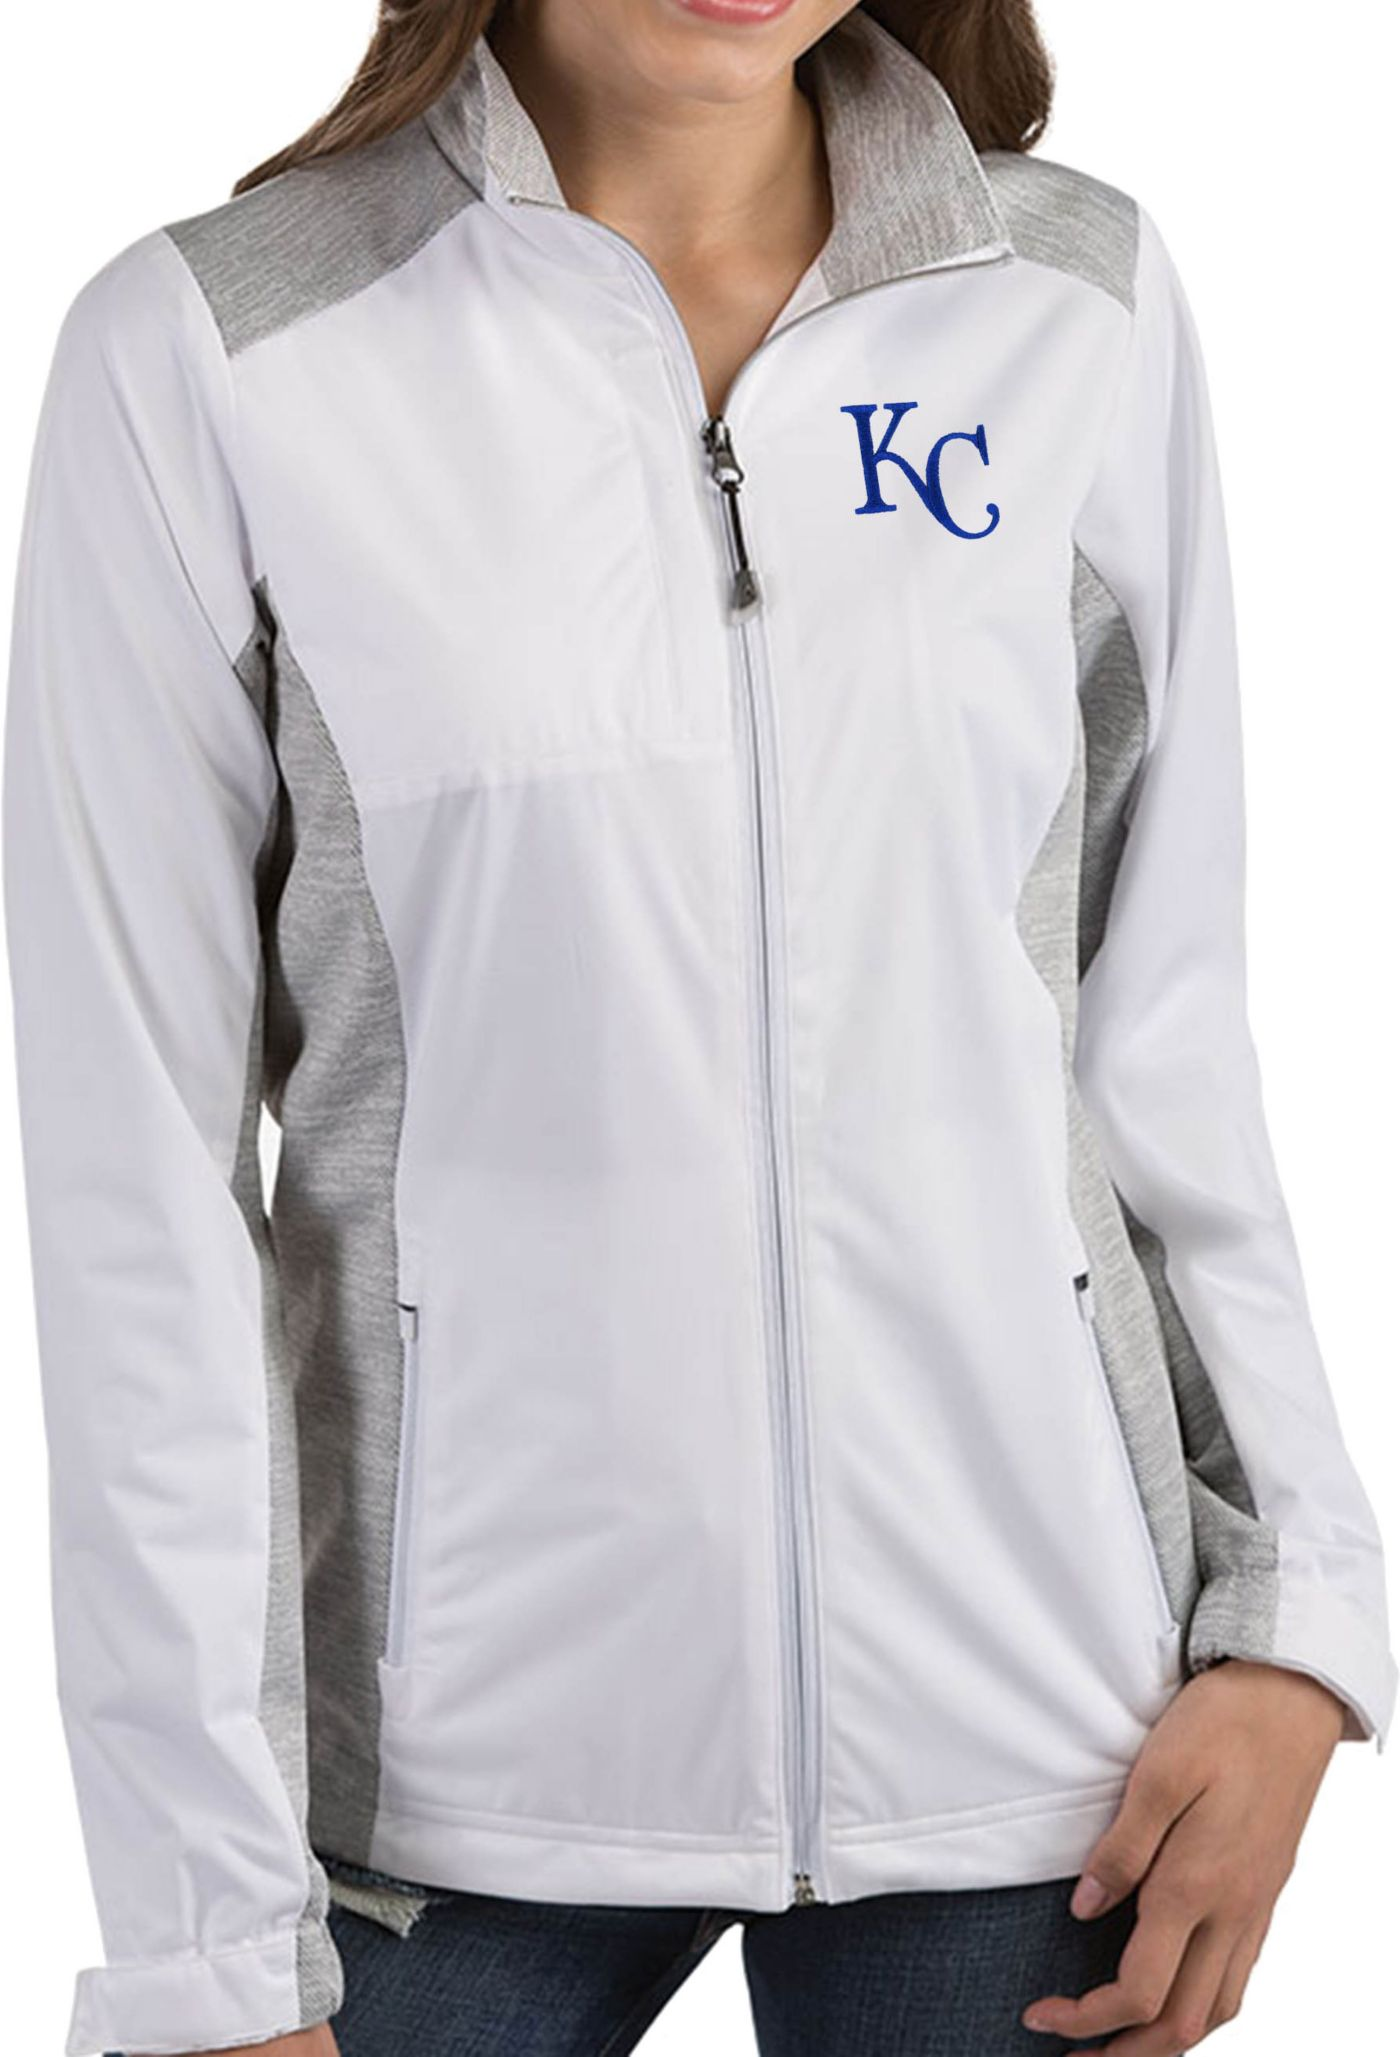 Antigua Women's Kansas City Royals Revolve White Full-Zip Jacket